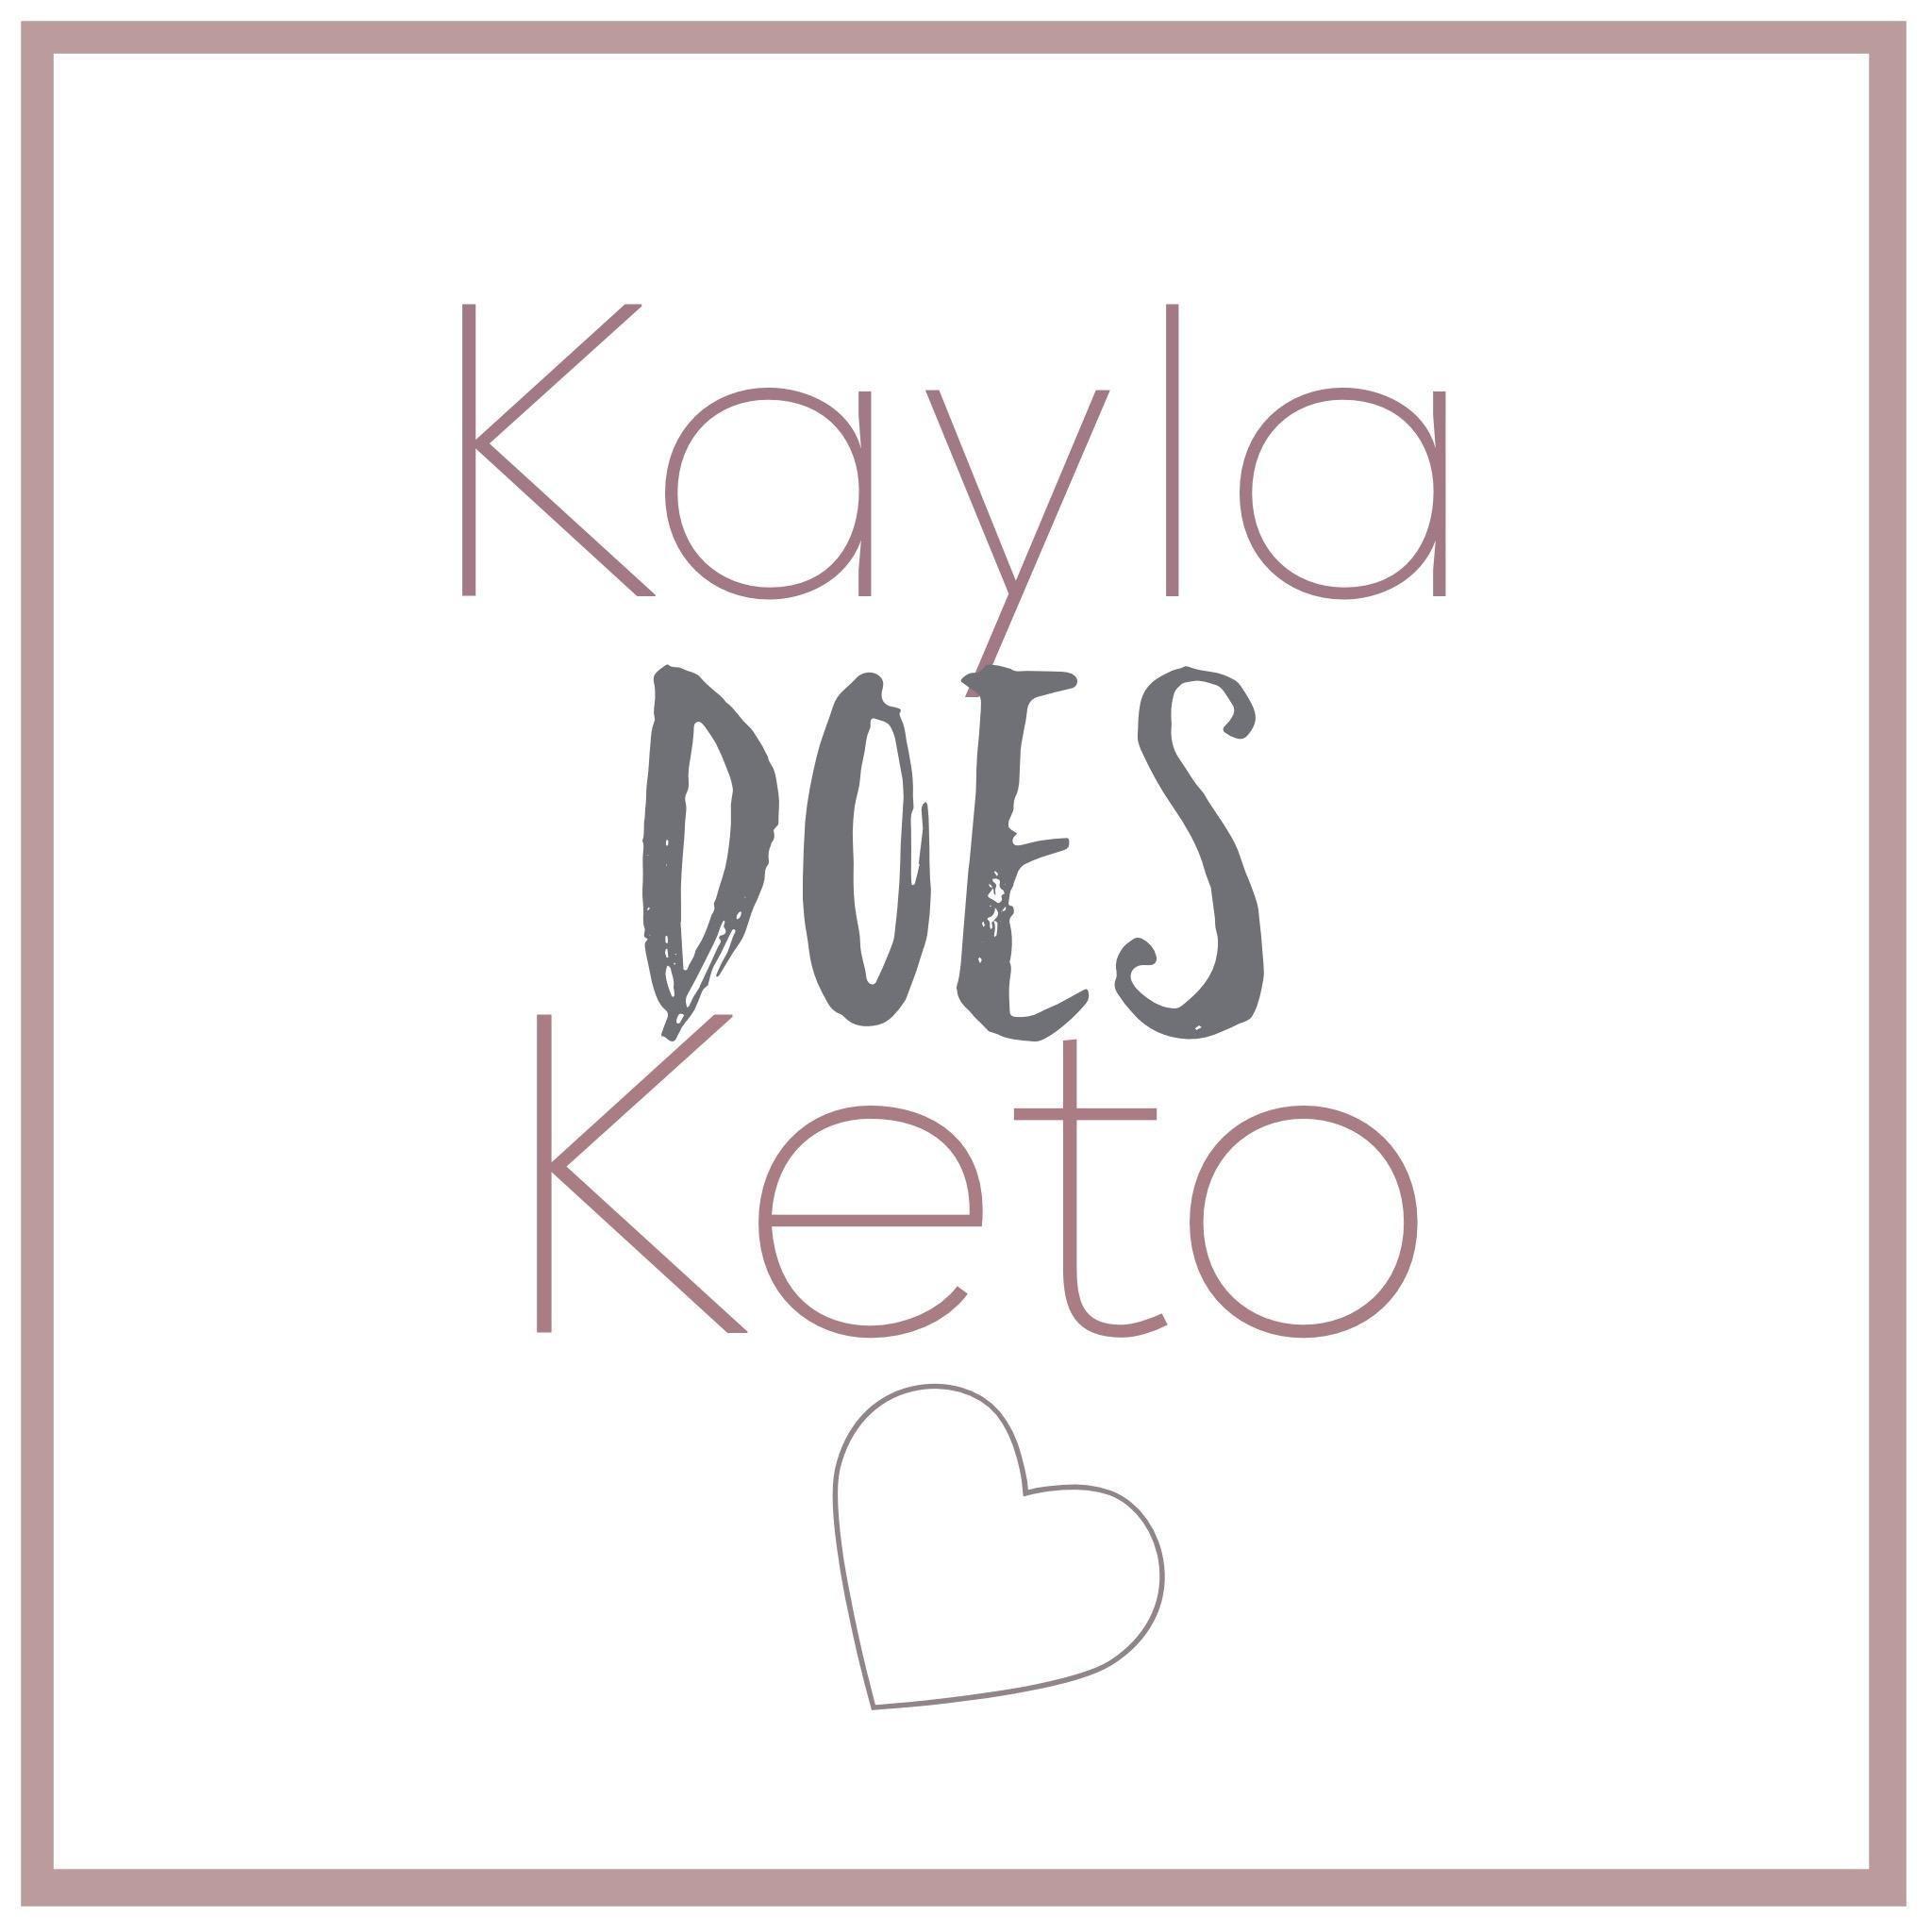 Beginning Keto (do's & Don'ts): Tips From Kayla